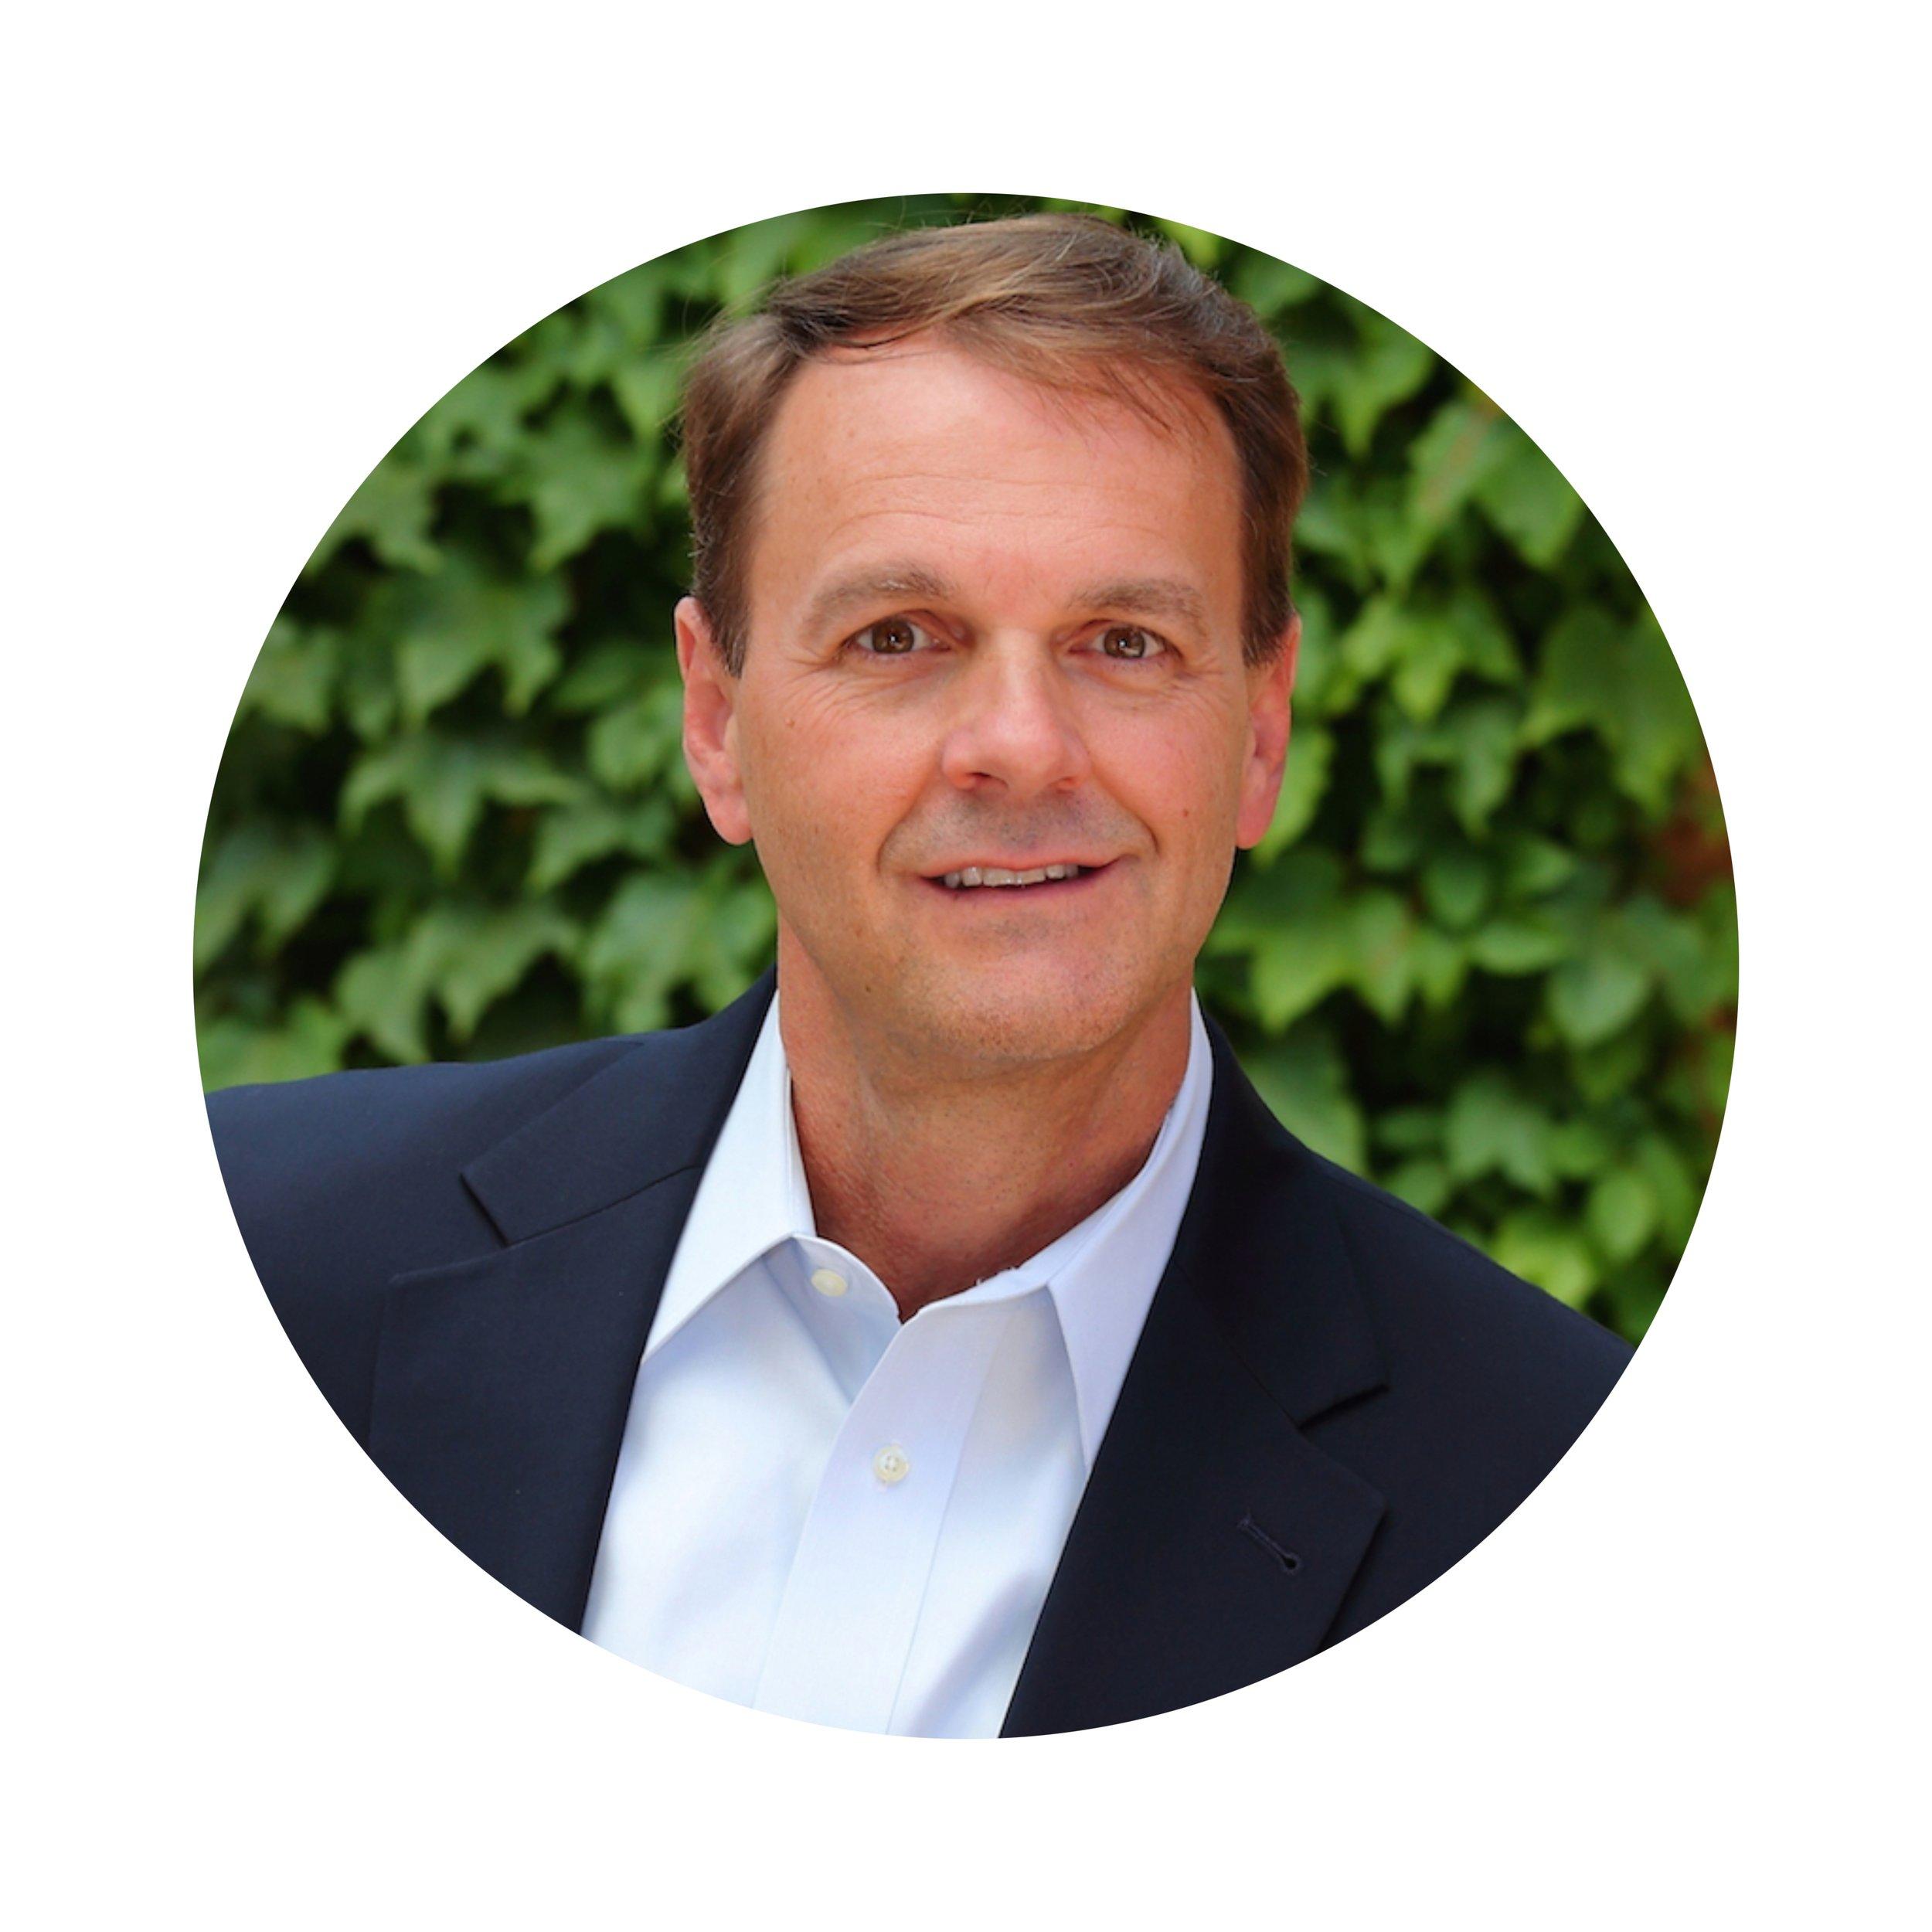 Scott Swisher, Advisor, Sales, SaaS